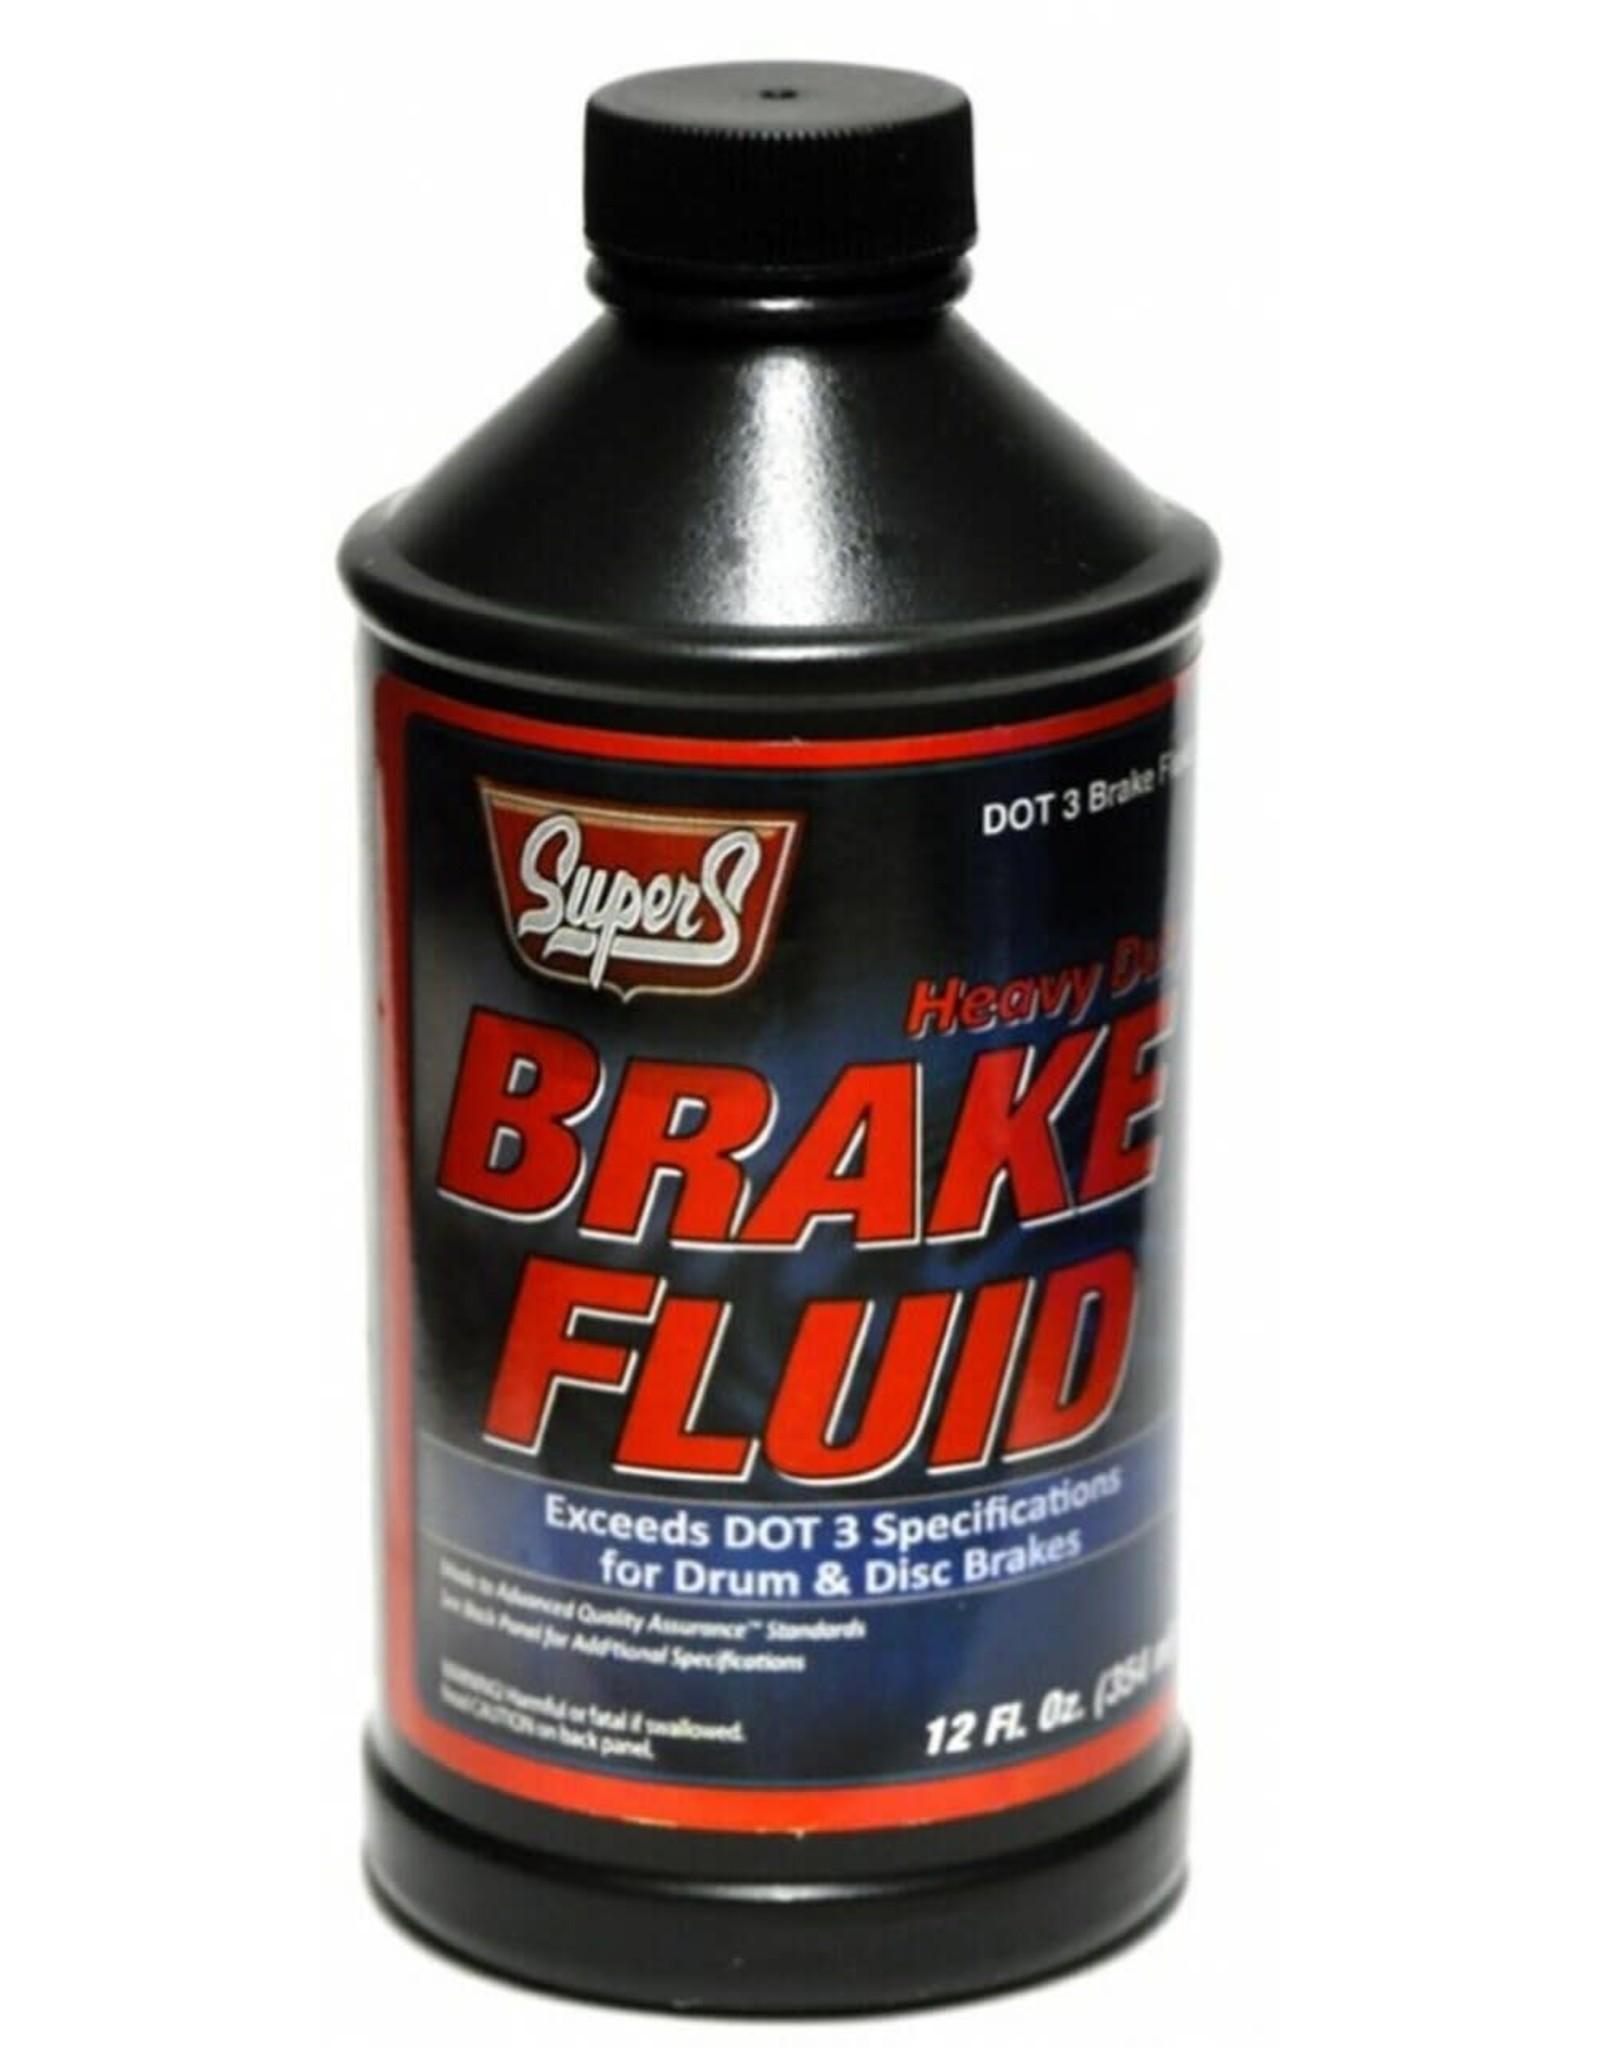 Super S Brake Fluid Qt